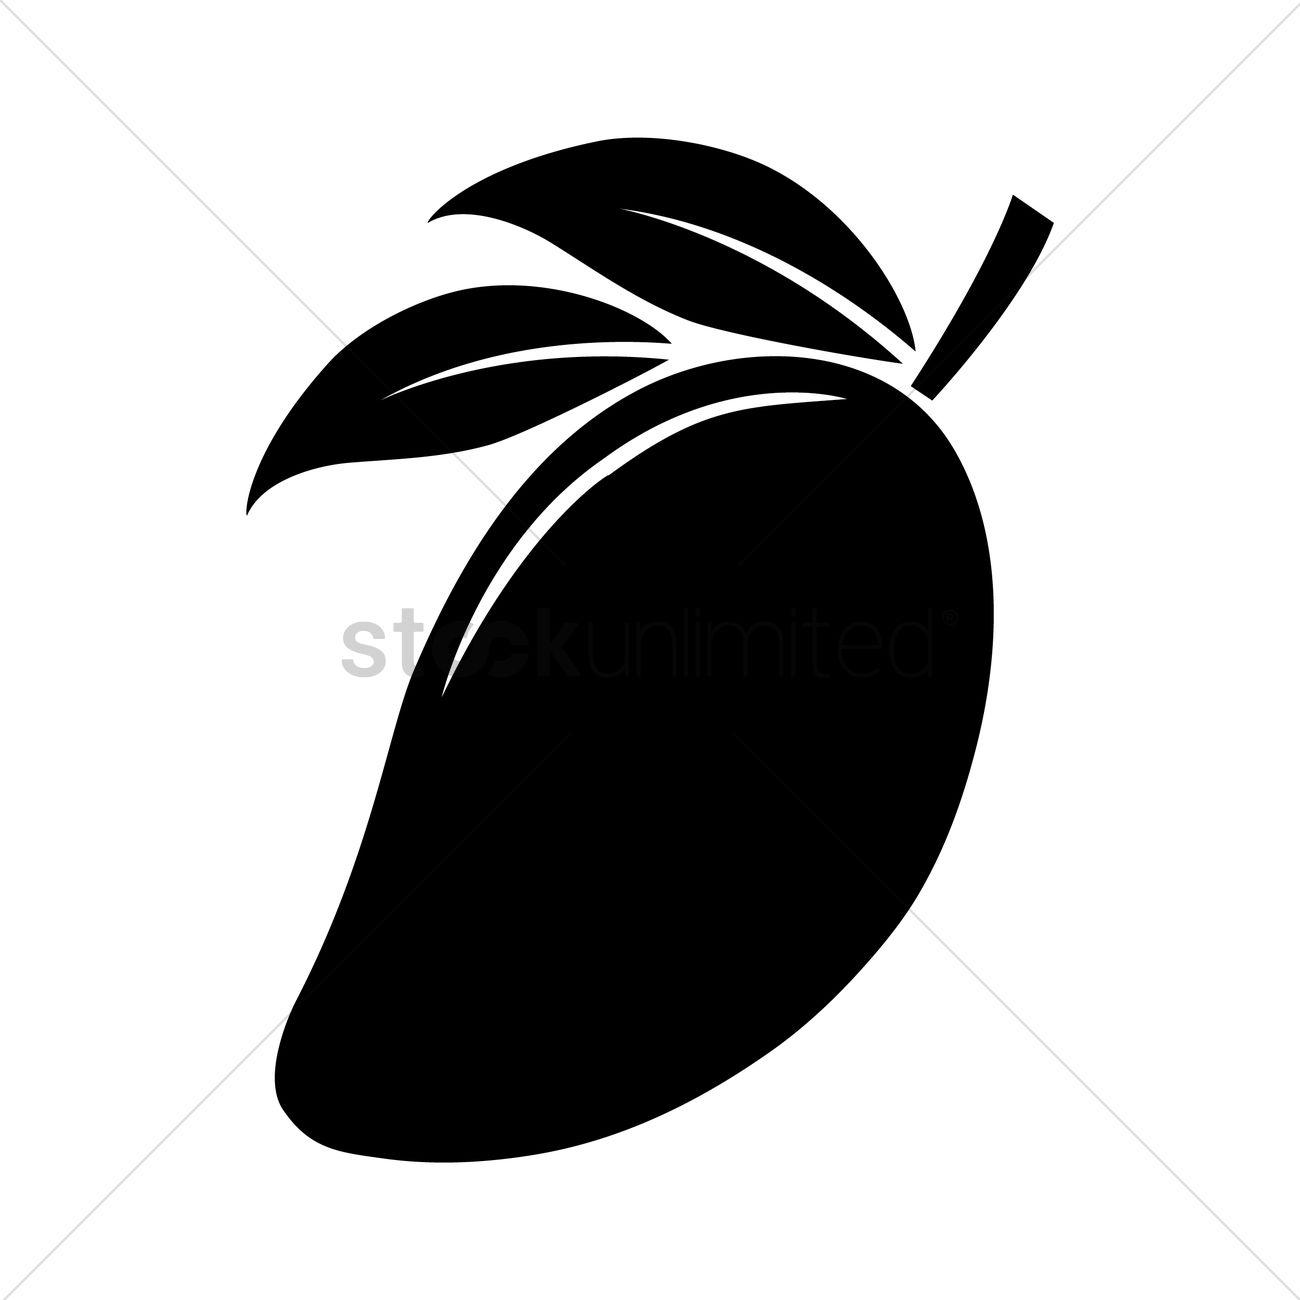 silhouette of mango vector image 1447189 stockunlimited island vector image island victoria bank jamaica